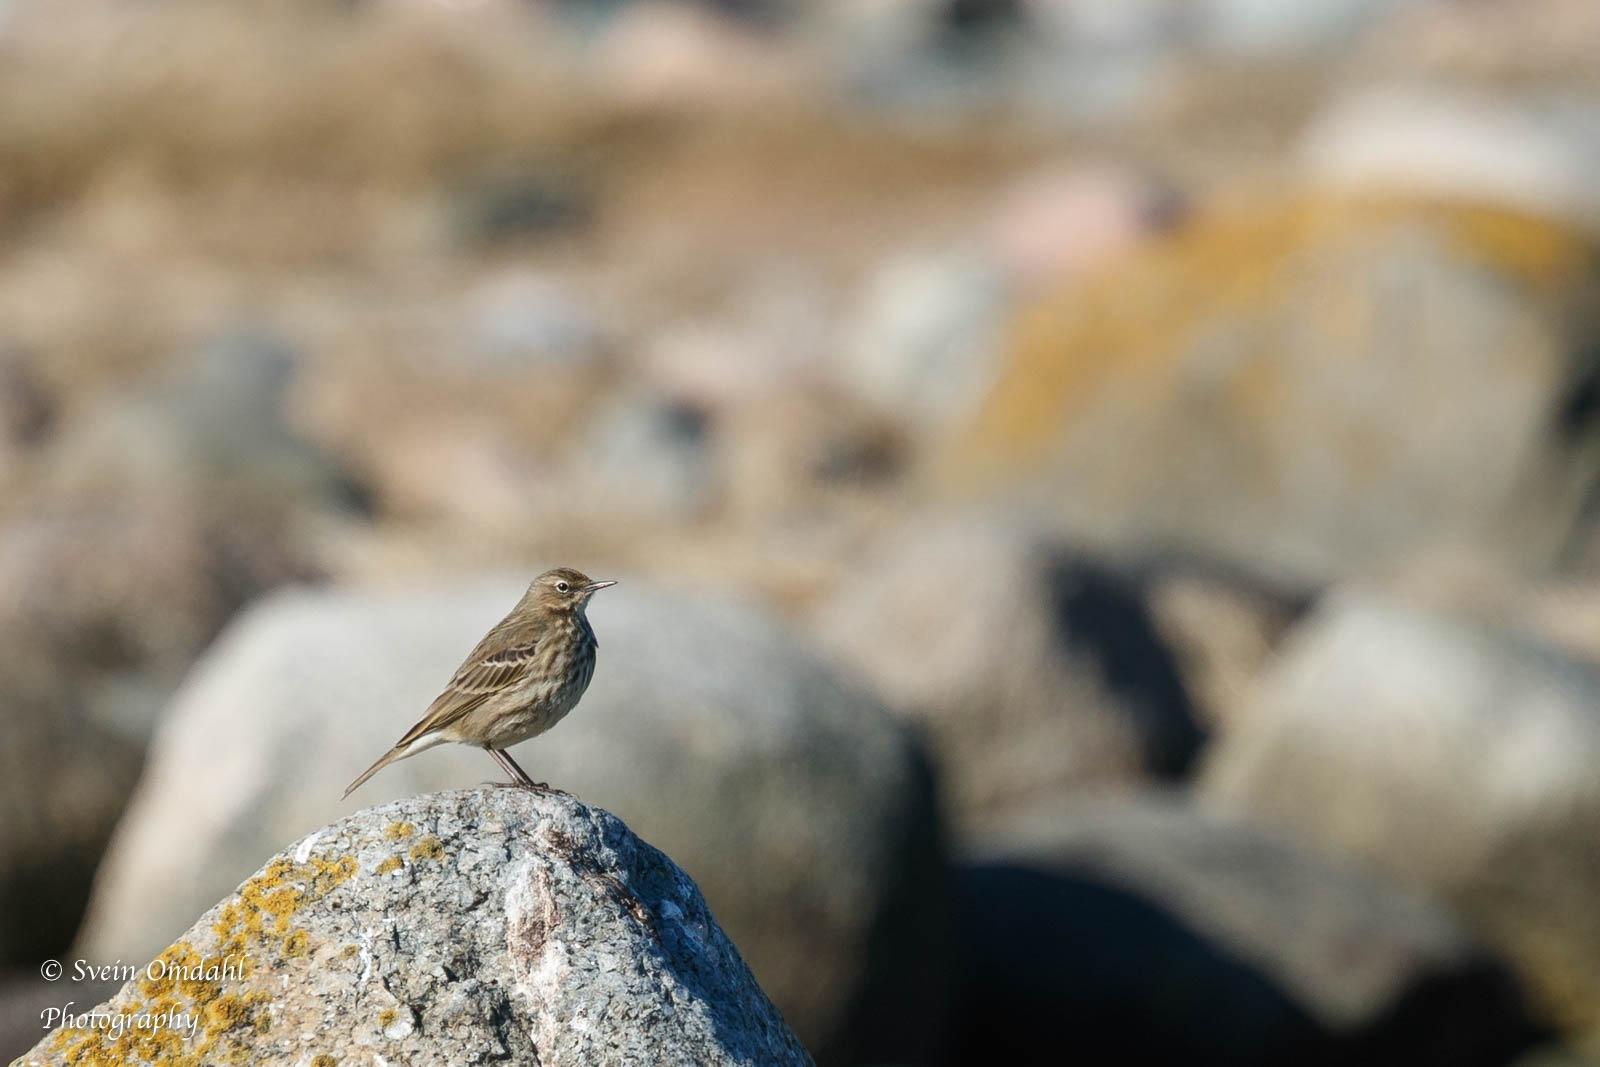 Bird on rock  by Svein Omdahl